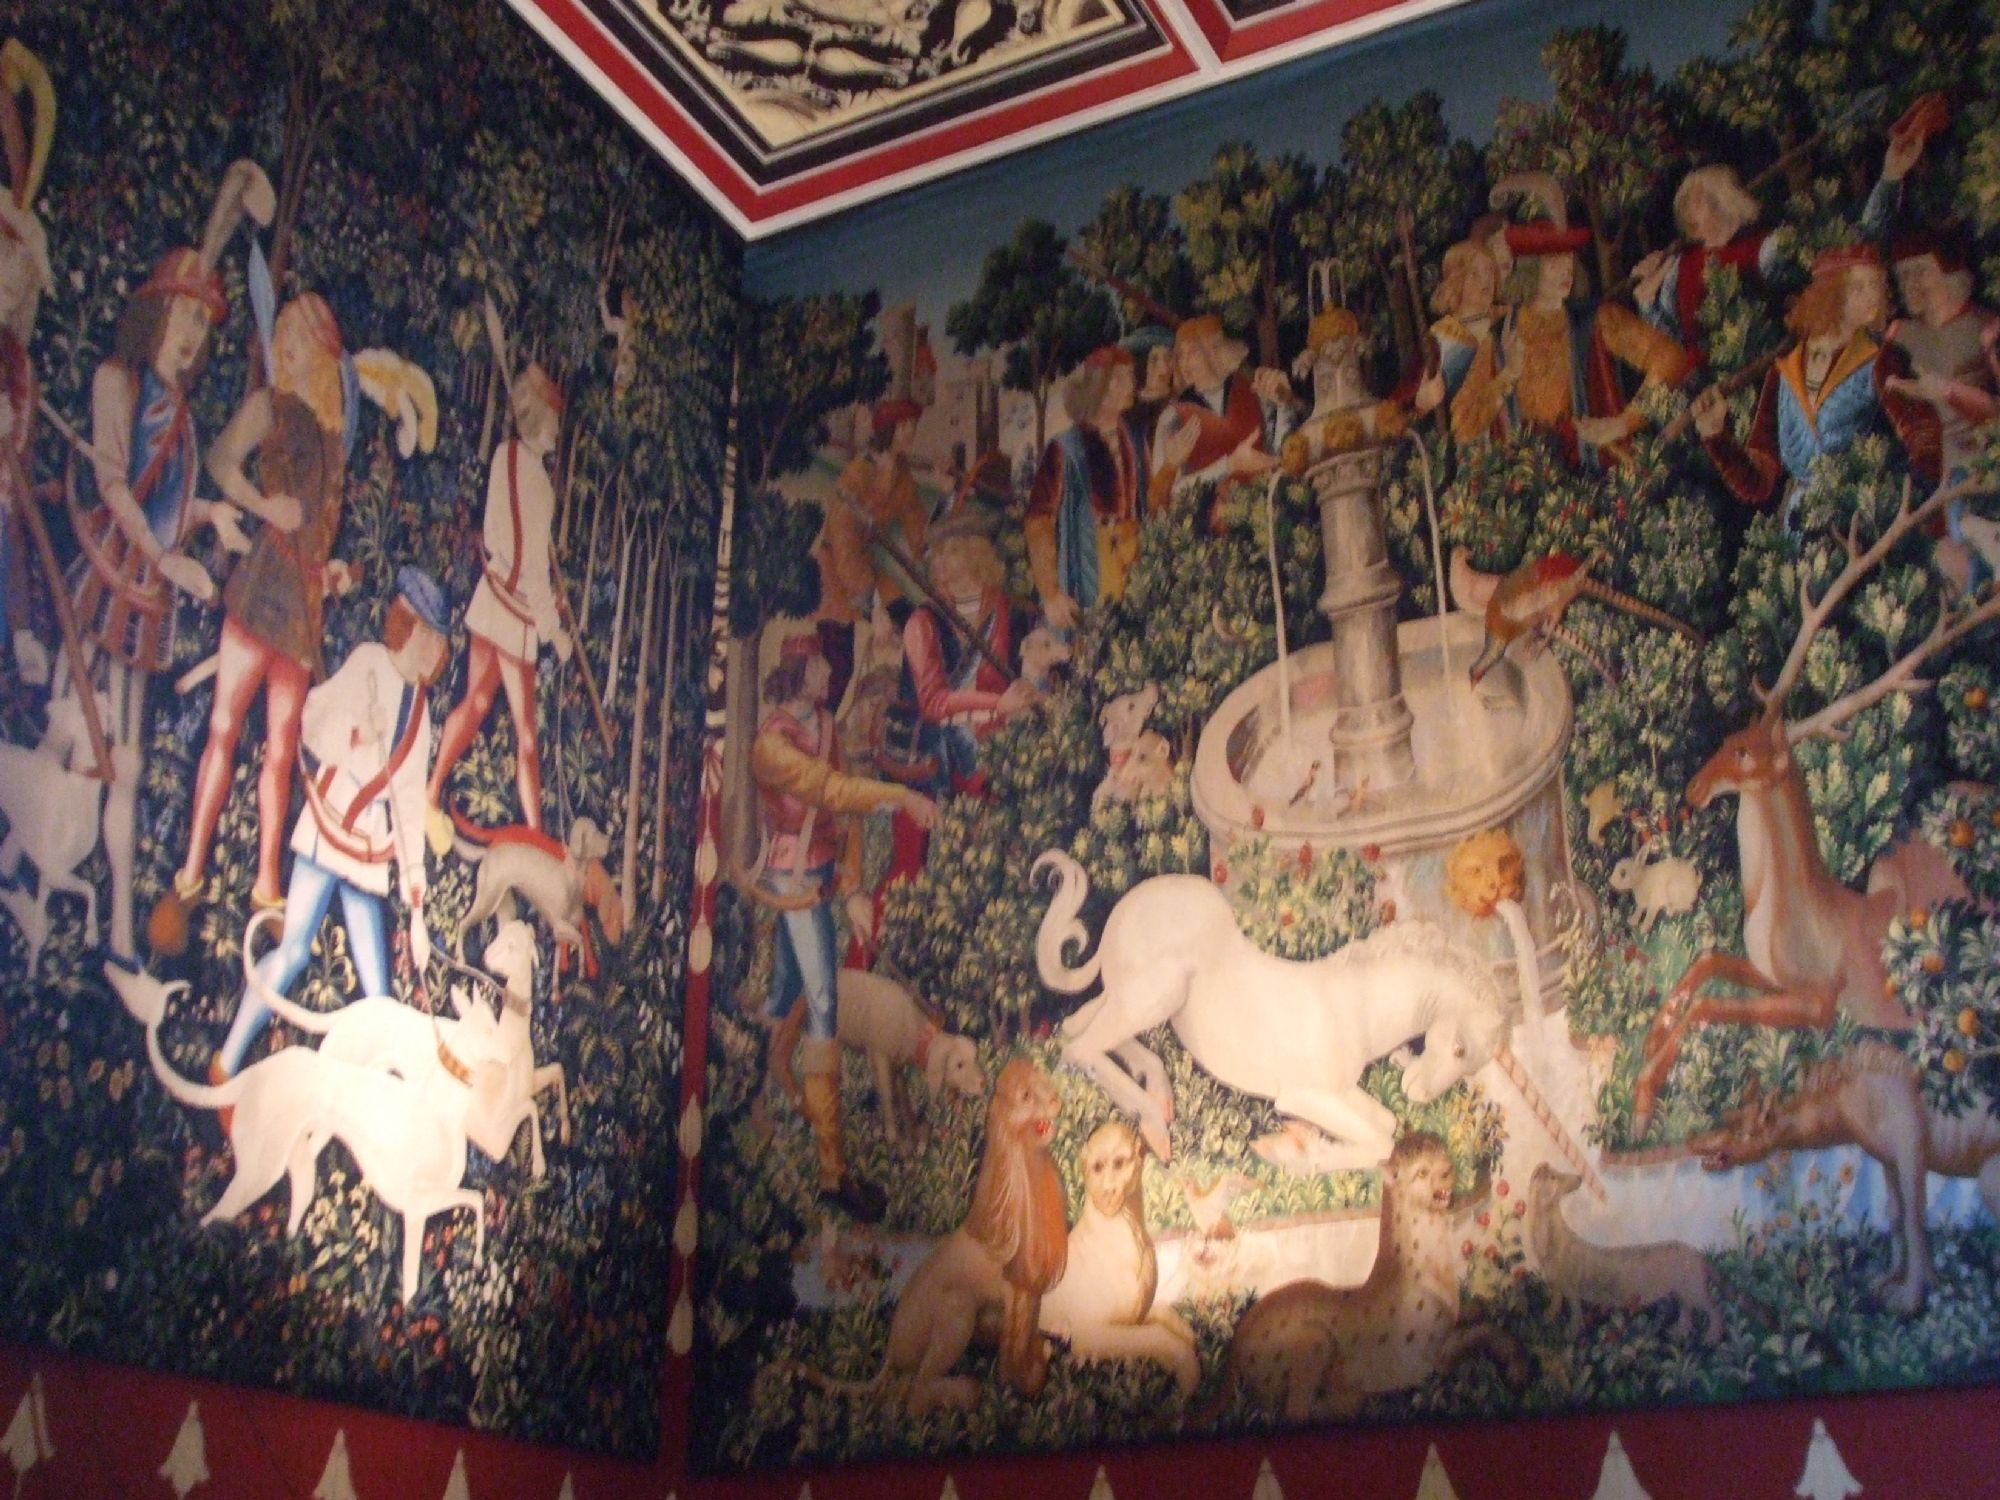 Tapestries on bedroom walls